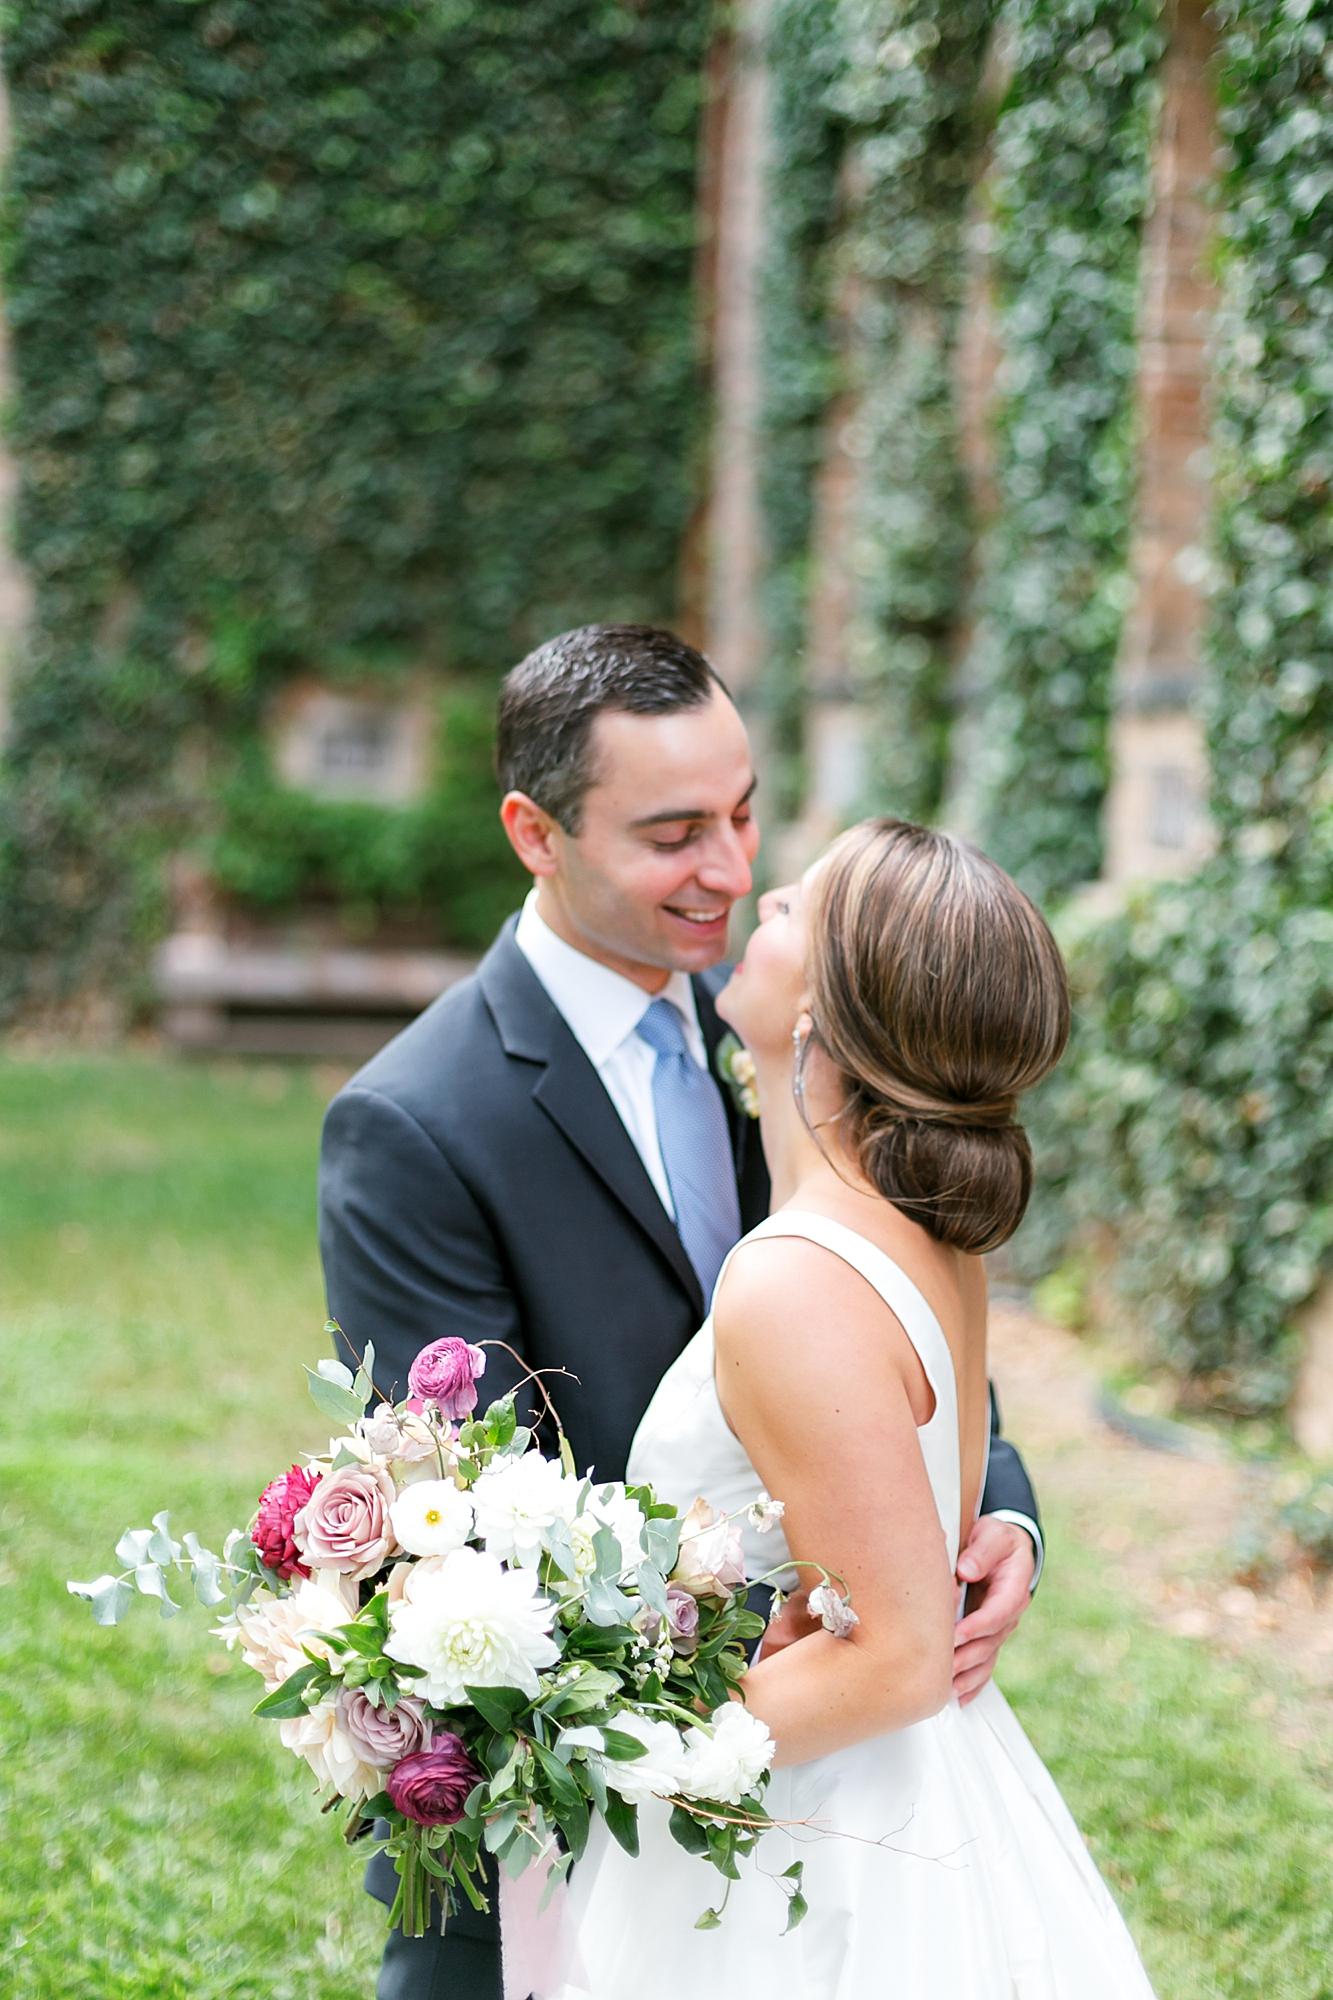 Princeton New Jersey Film Wedding Photographer Princeton University Wedding Photography by Magdalena Studios NJ Wedding Photographer23